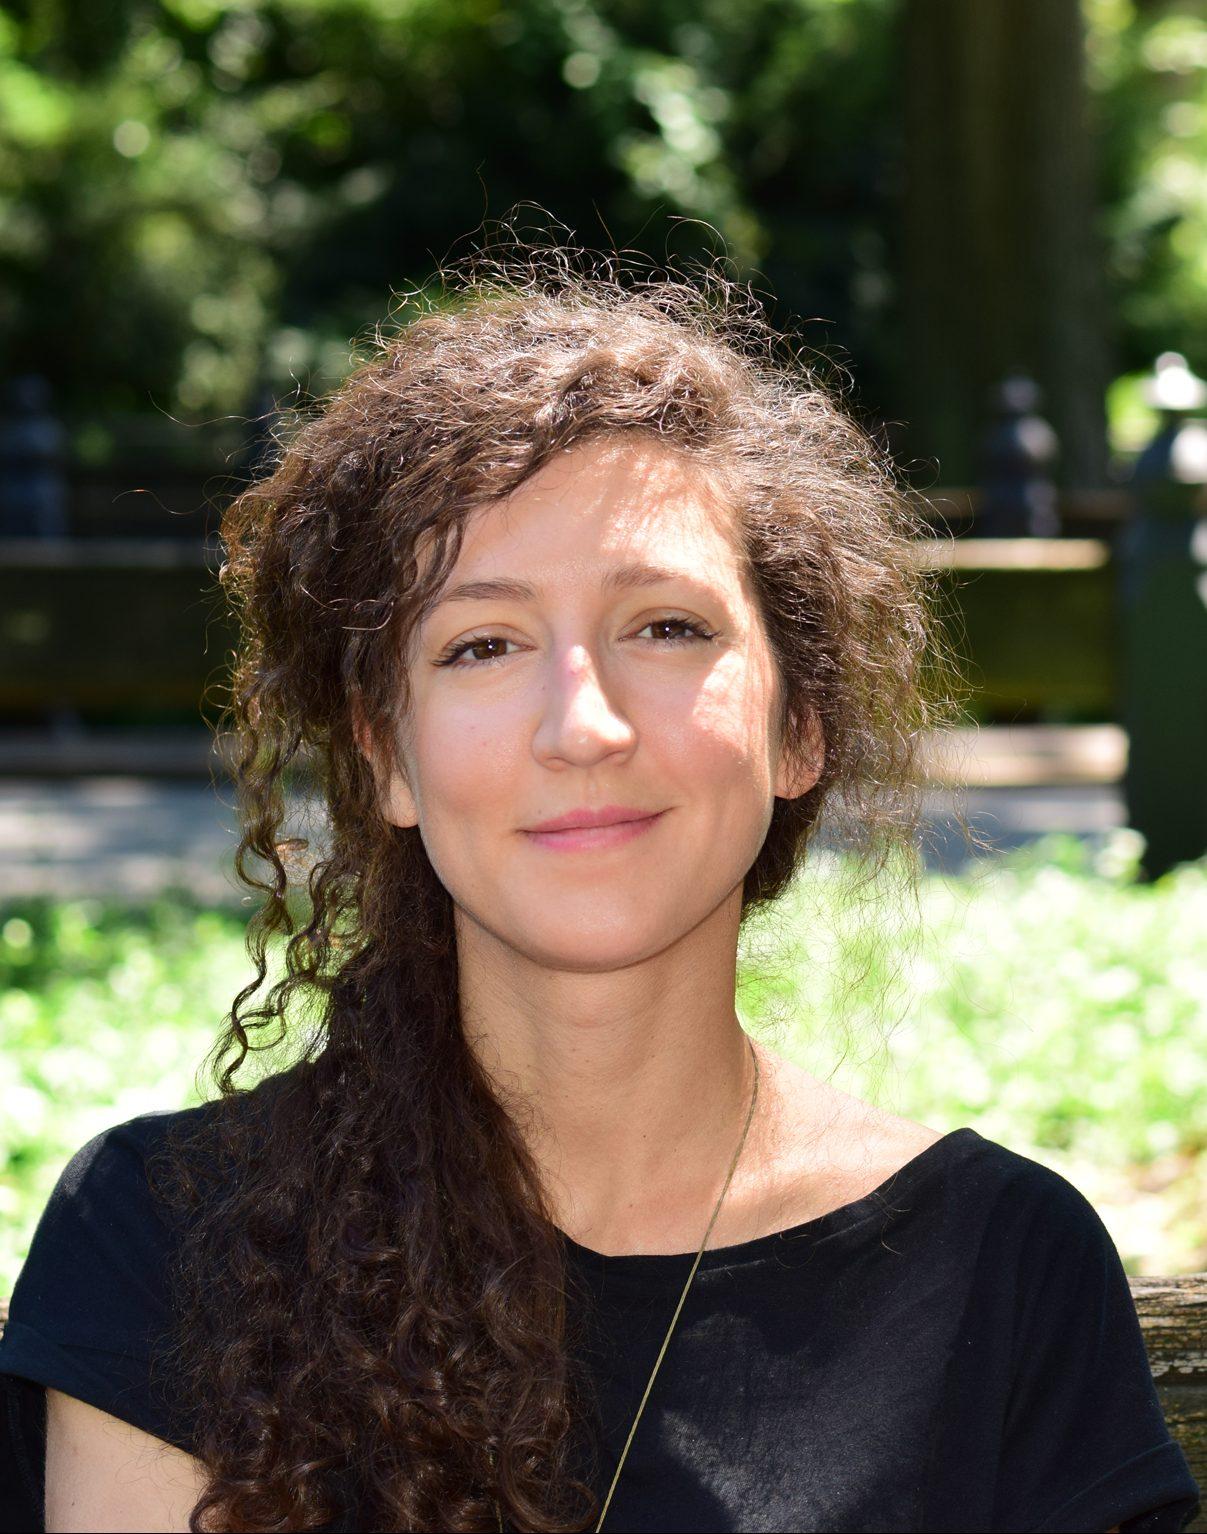 Maria Sitzoglou